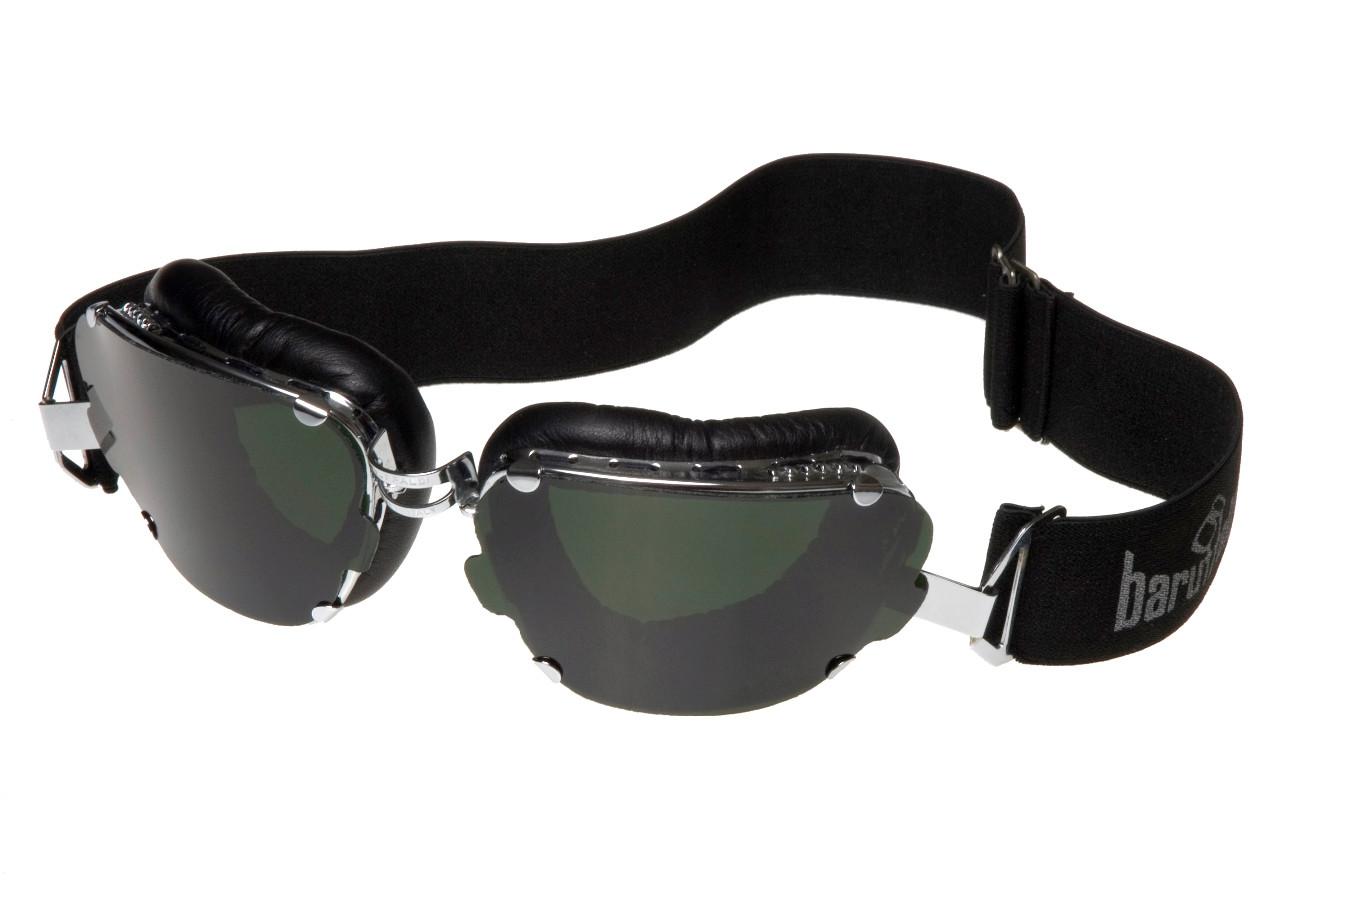 4be23a56842 Motorcycle goggles Baruffaldi Inte 259 black